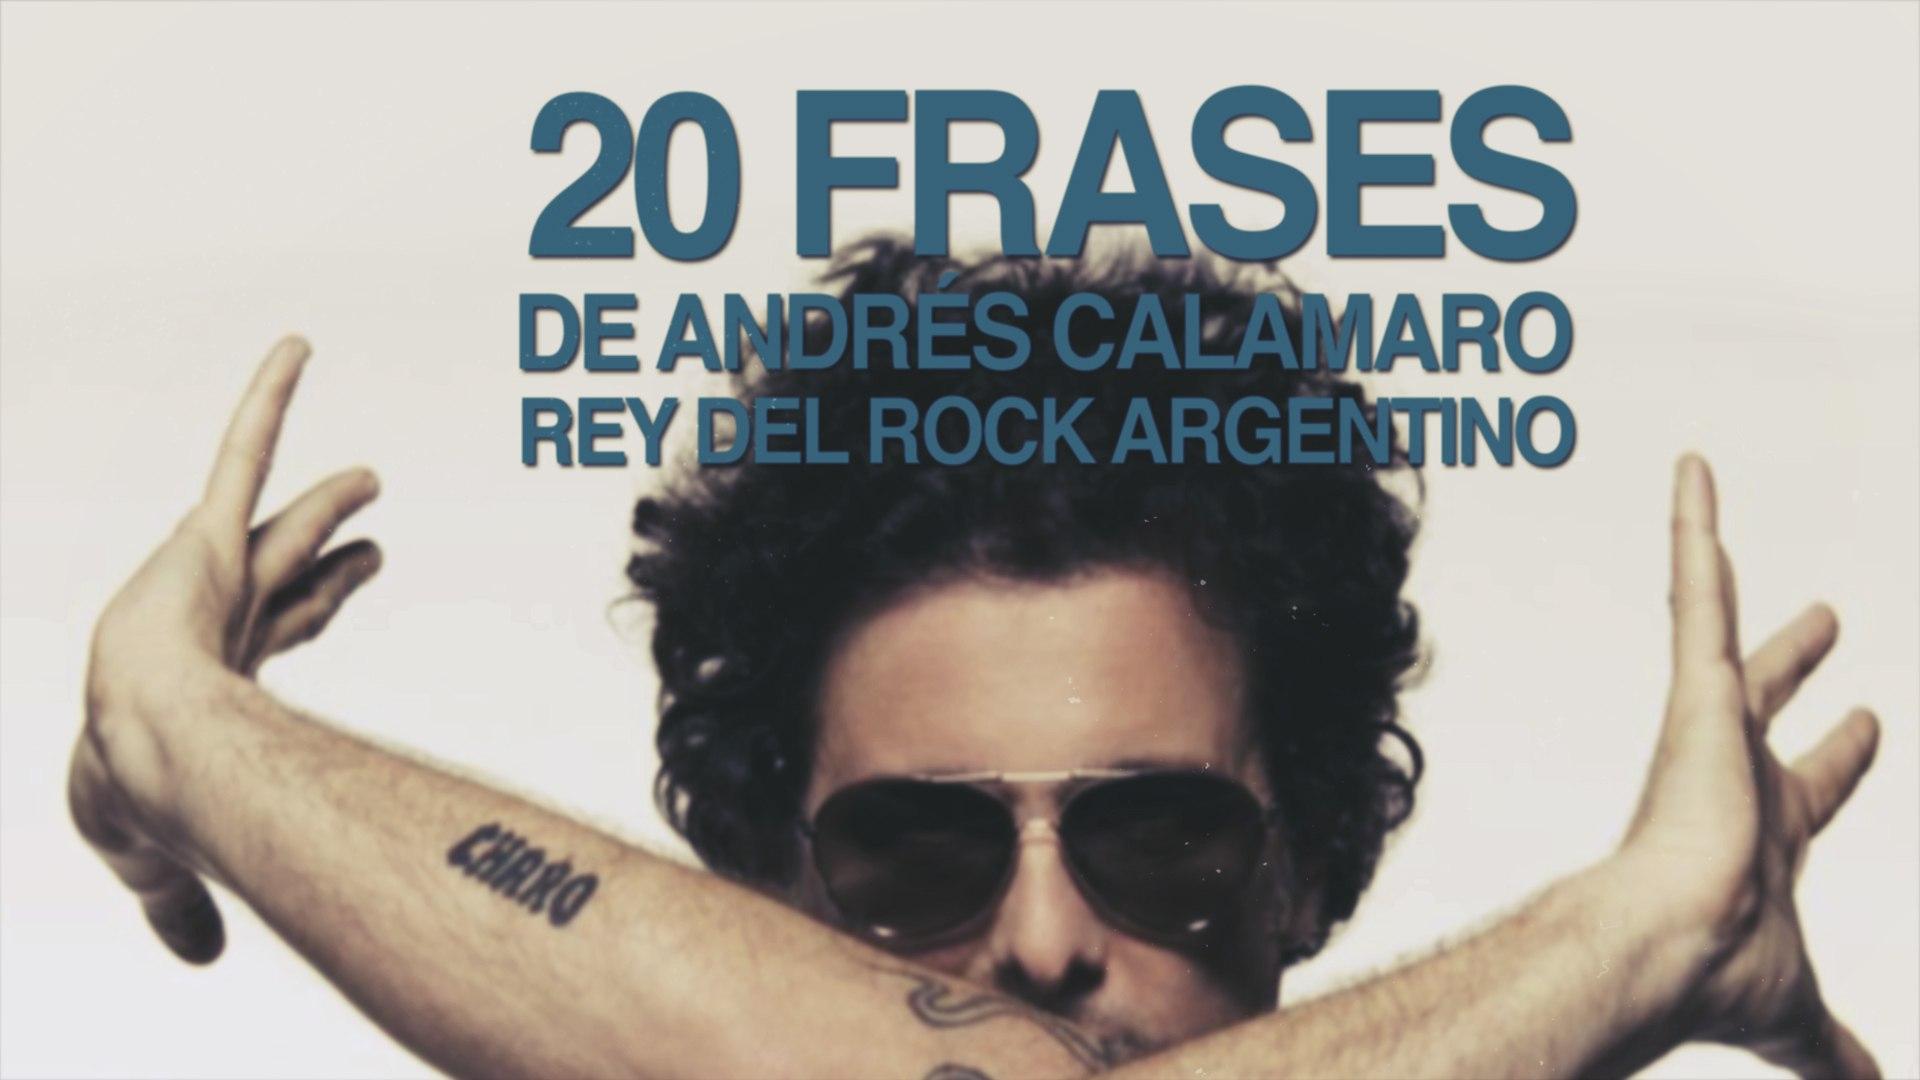 20 Frases De Andrés Calamaro El Rey Del Rock Argentino